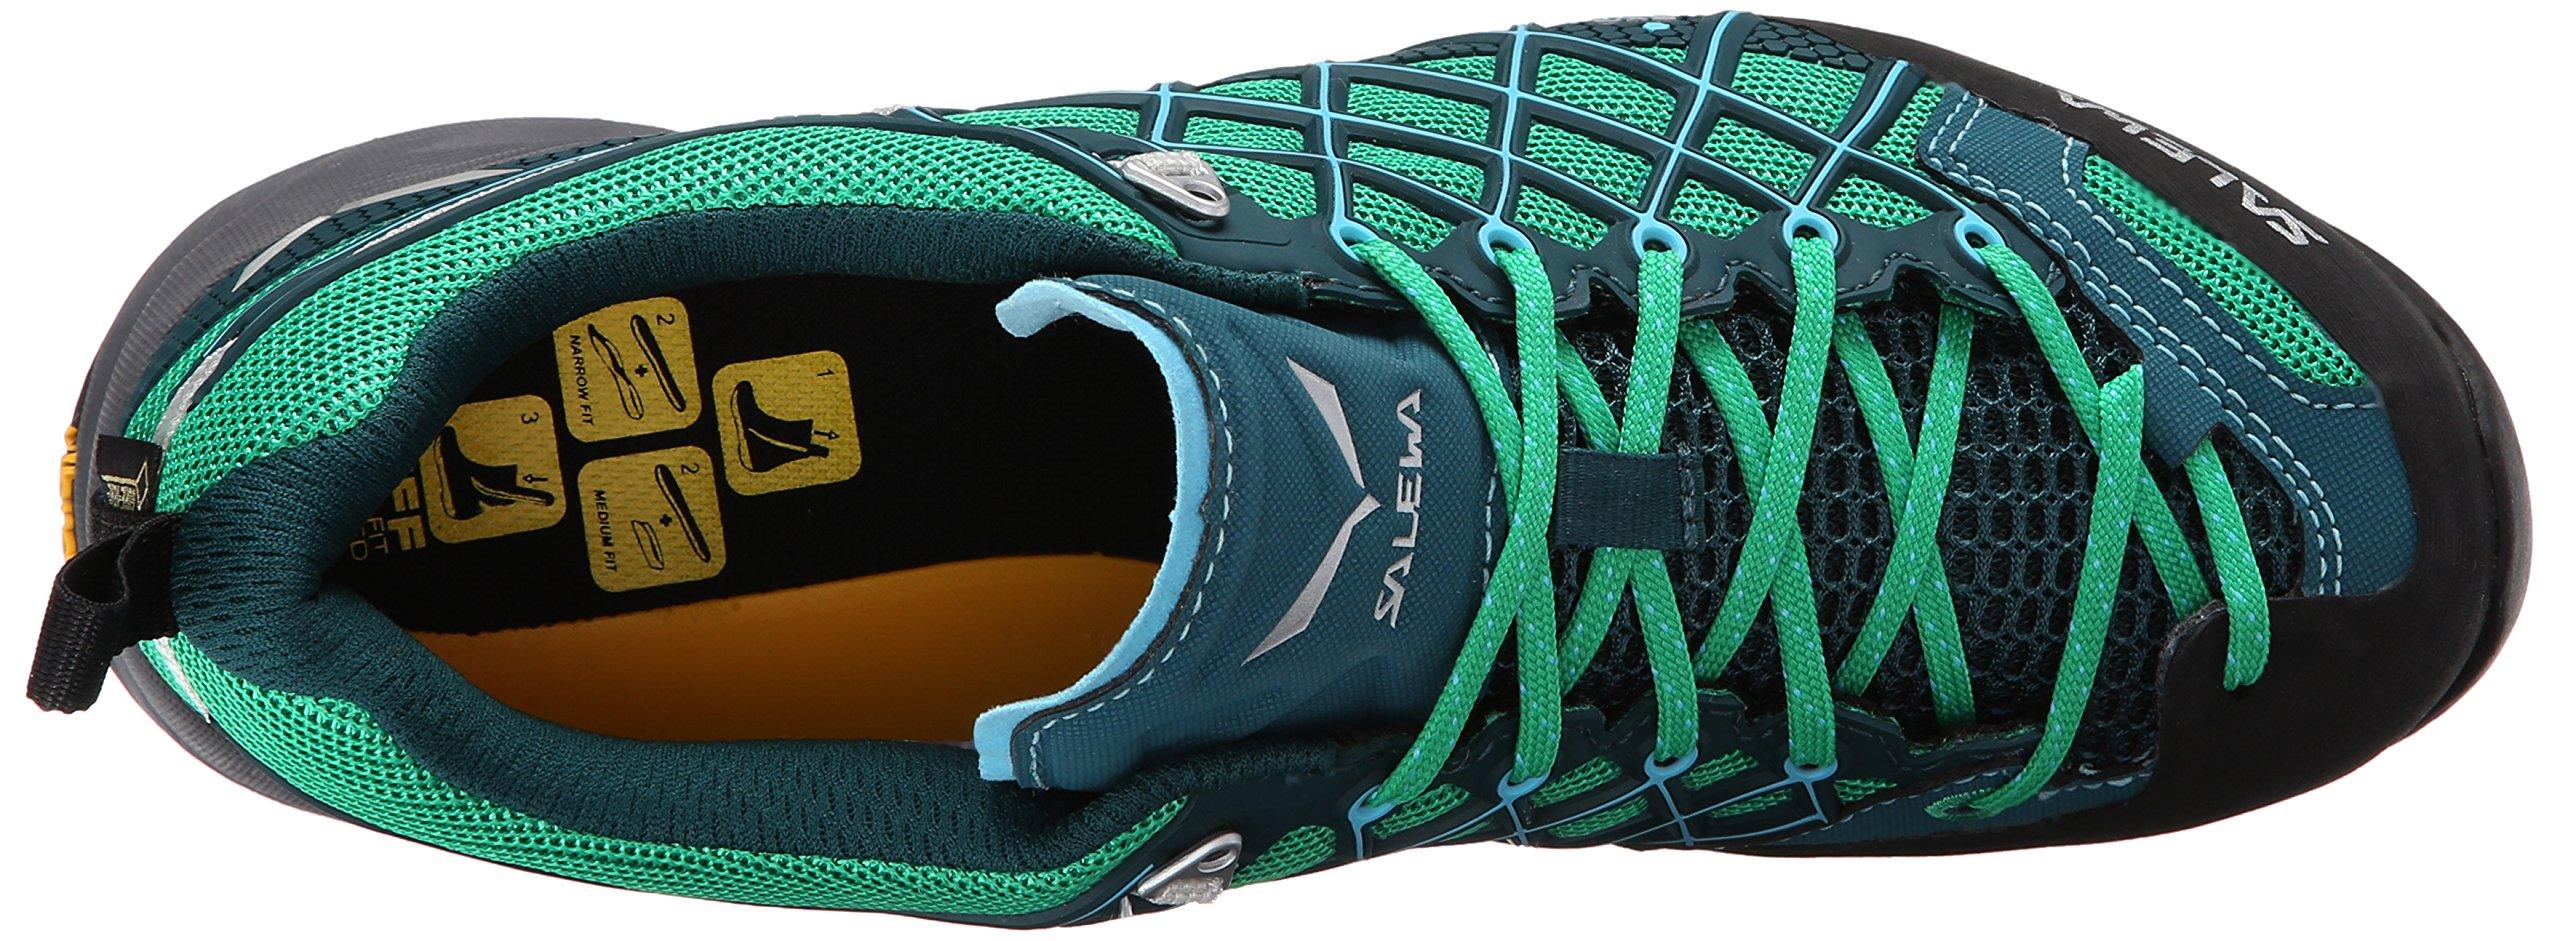 Salewa Women's Wildfire S GTX Technical Approach Shoe, Cypress/River Blue, 6.5 M US by Salewa (Image #7)